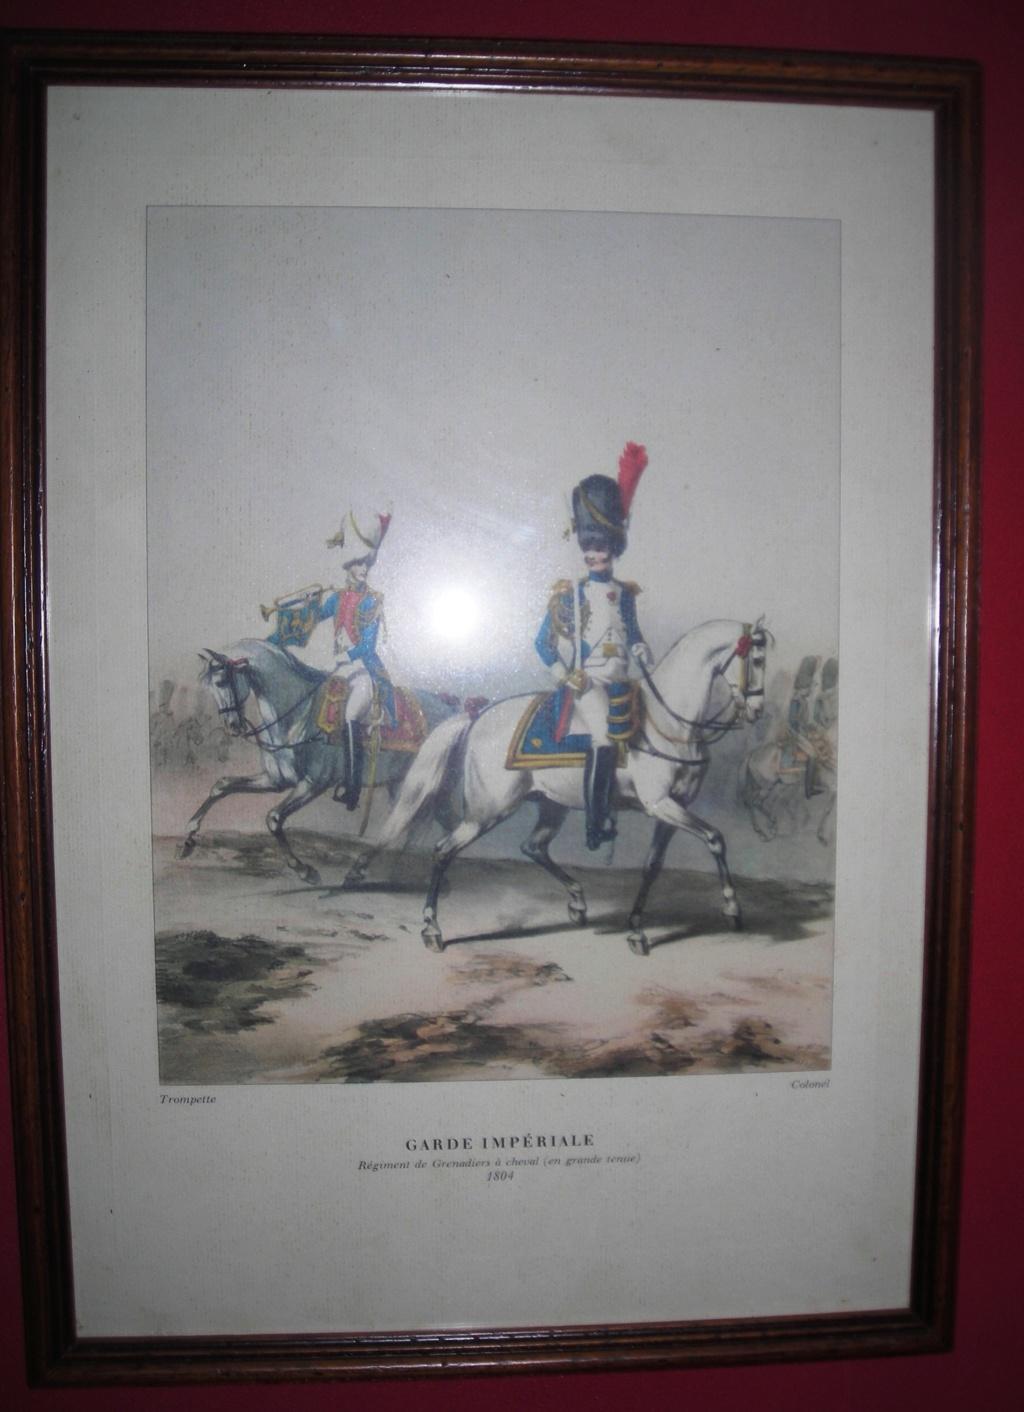 VENTE GRAVURES PREMIER EMPIRE, GARDE IMPERIALE. 1804_210